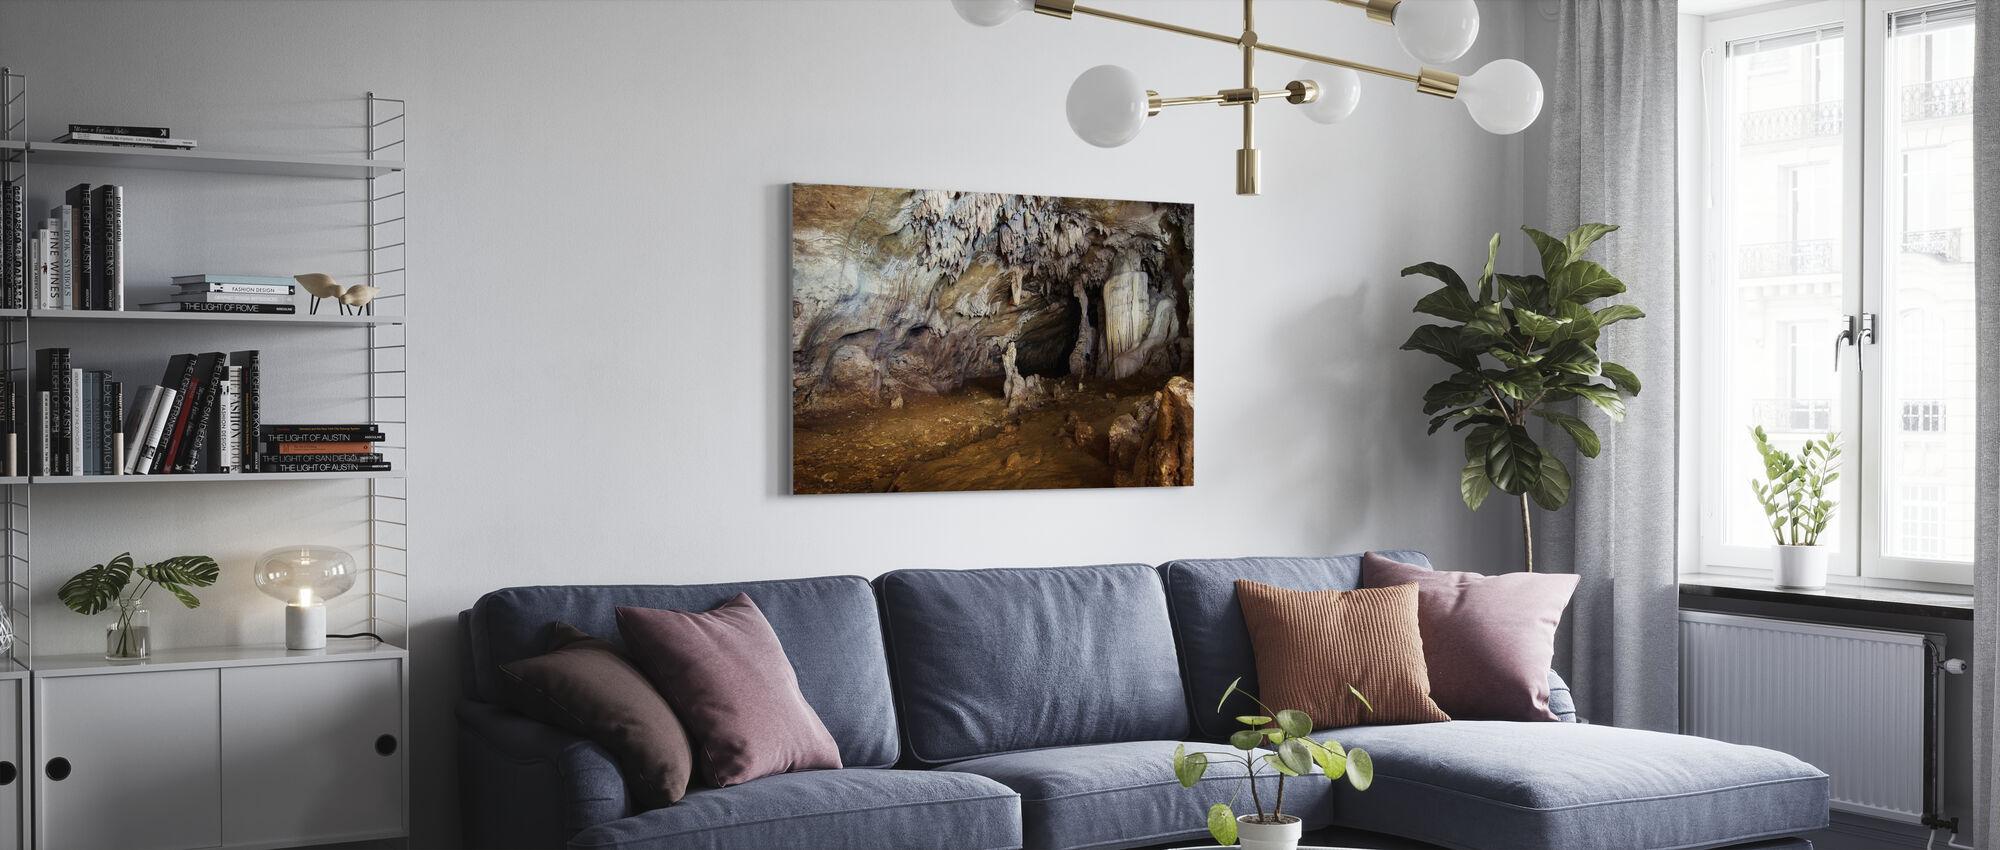 Sohoton Höhle - Leinwandbild - Wohnzimmer